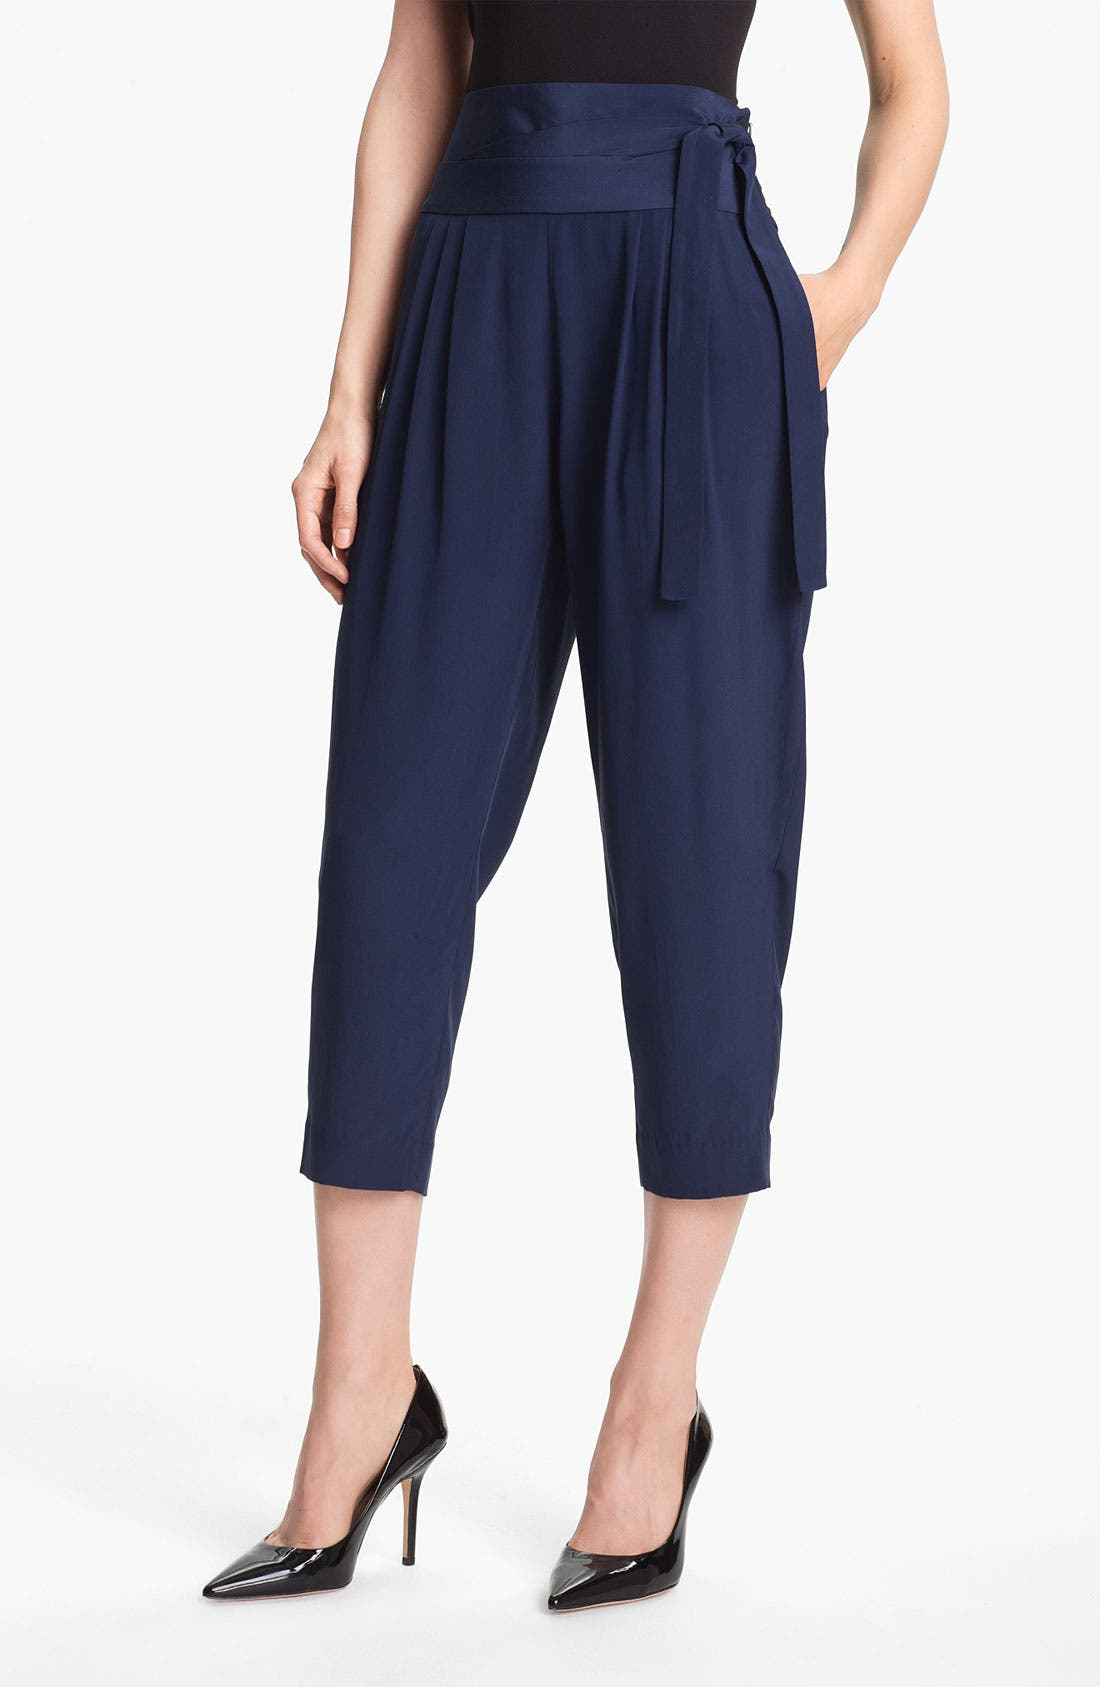 Alternate Image 1 Selected - Diane von Furstenberg 'Keaka' Silk Capri Pants